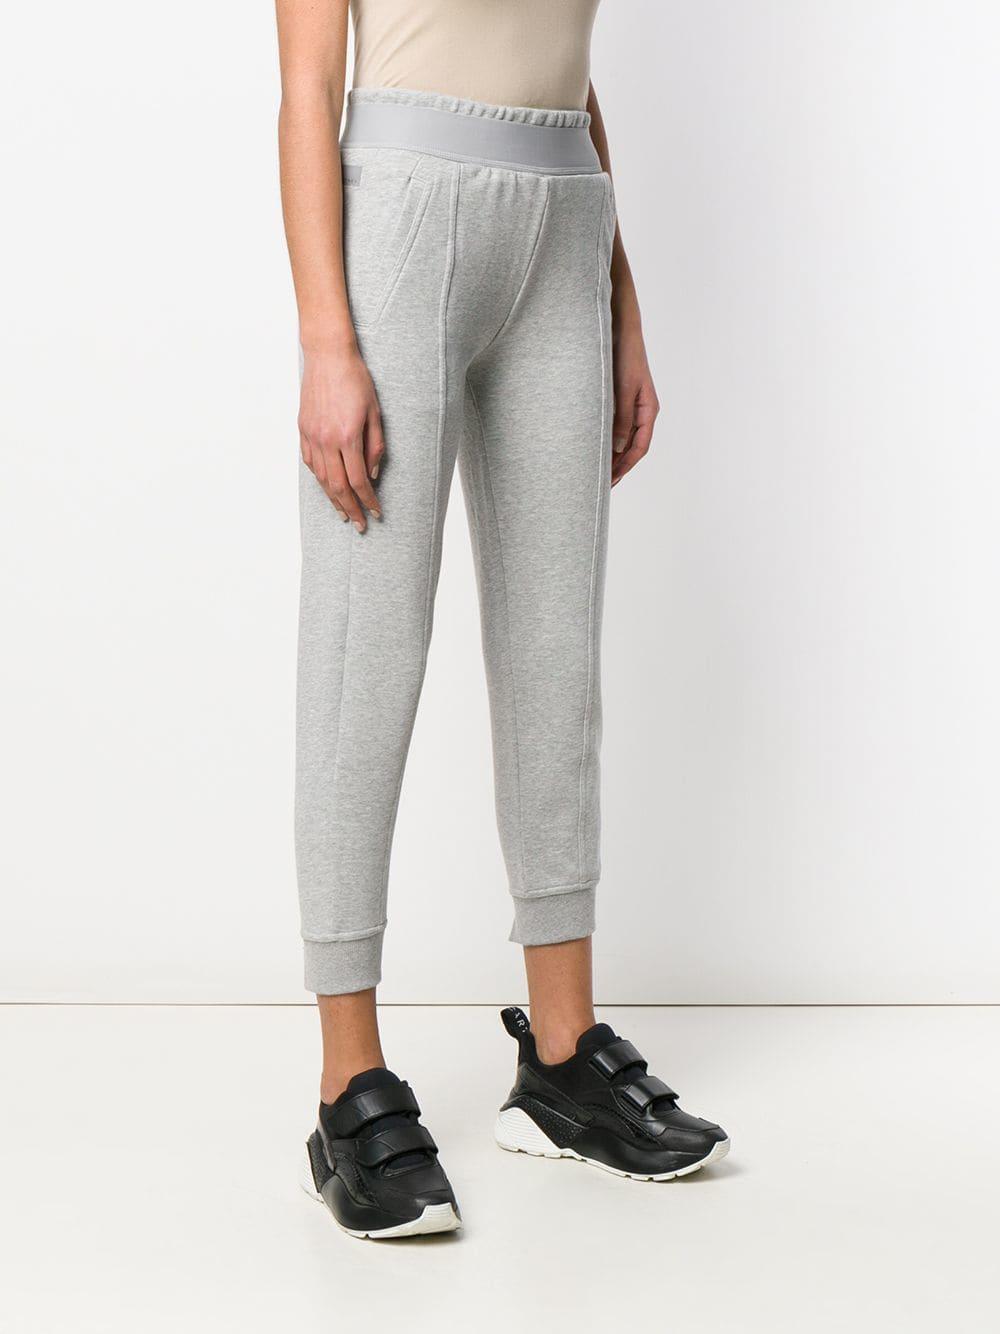 76798585e Adidas By Stella McCartney - Gray High Waisted Sweatpants - Lyst. View  fullscreen